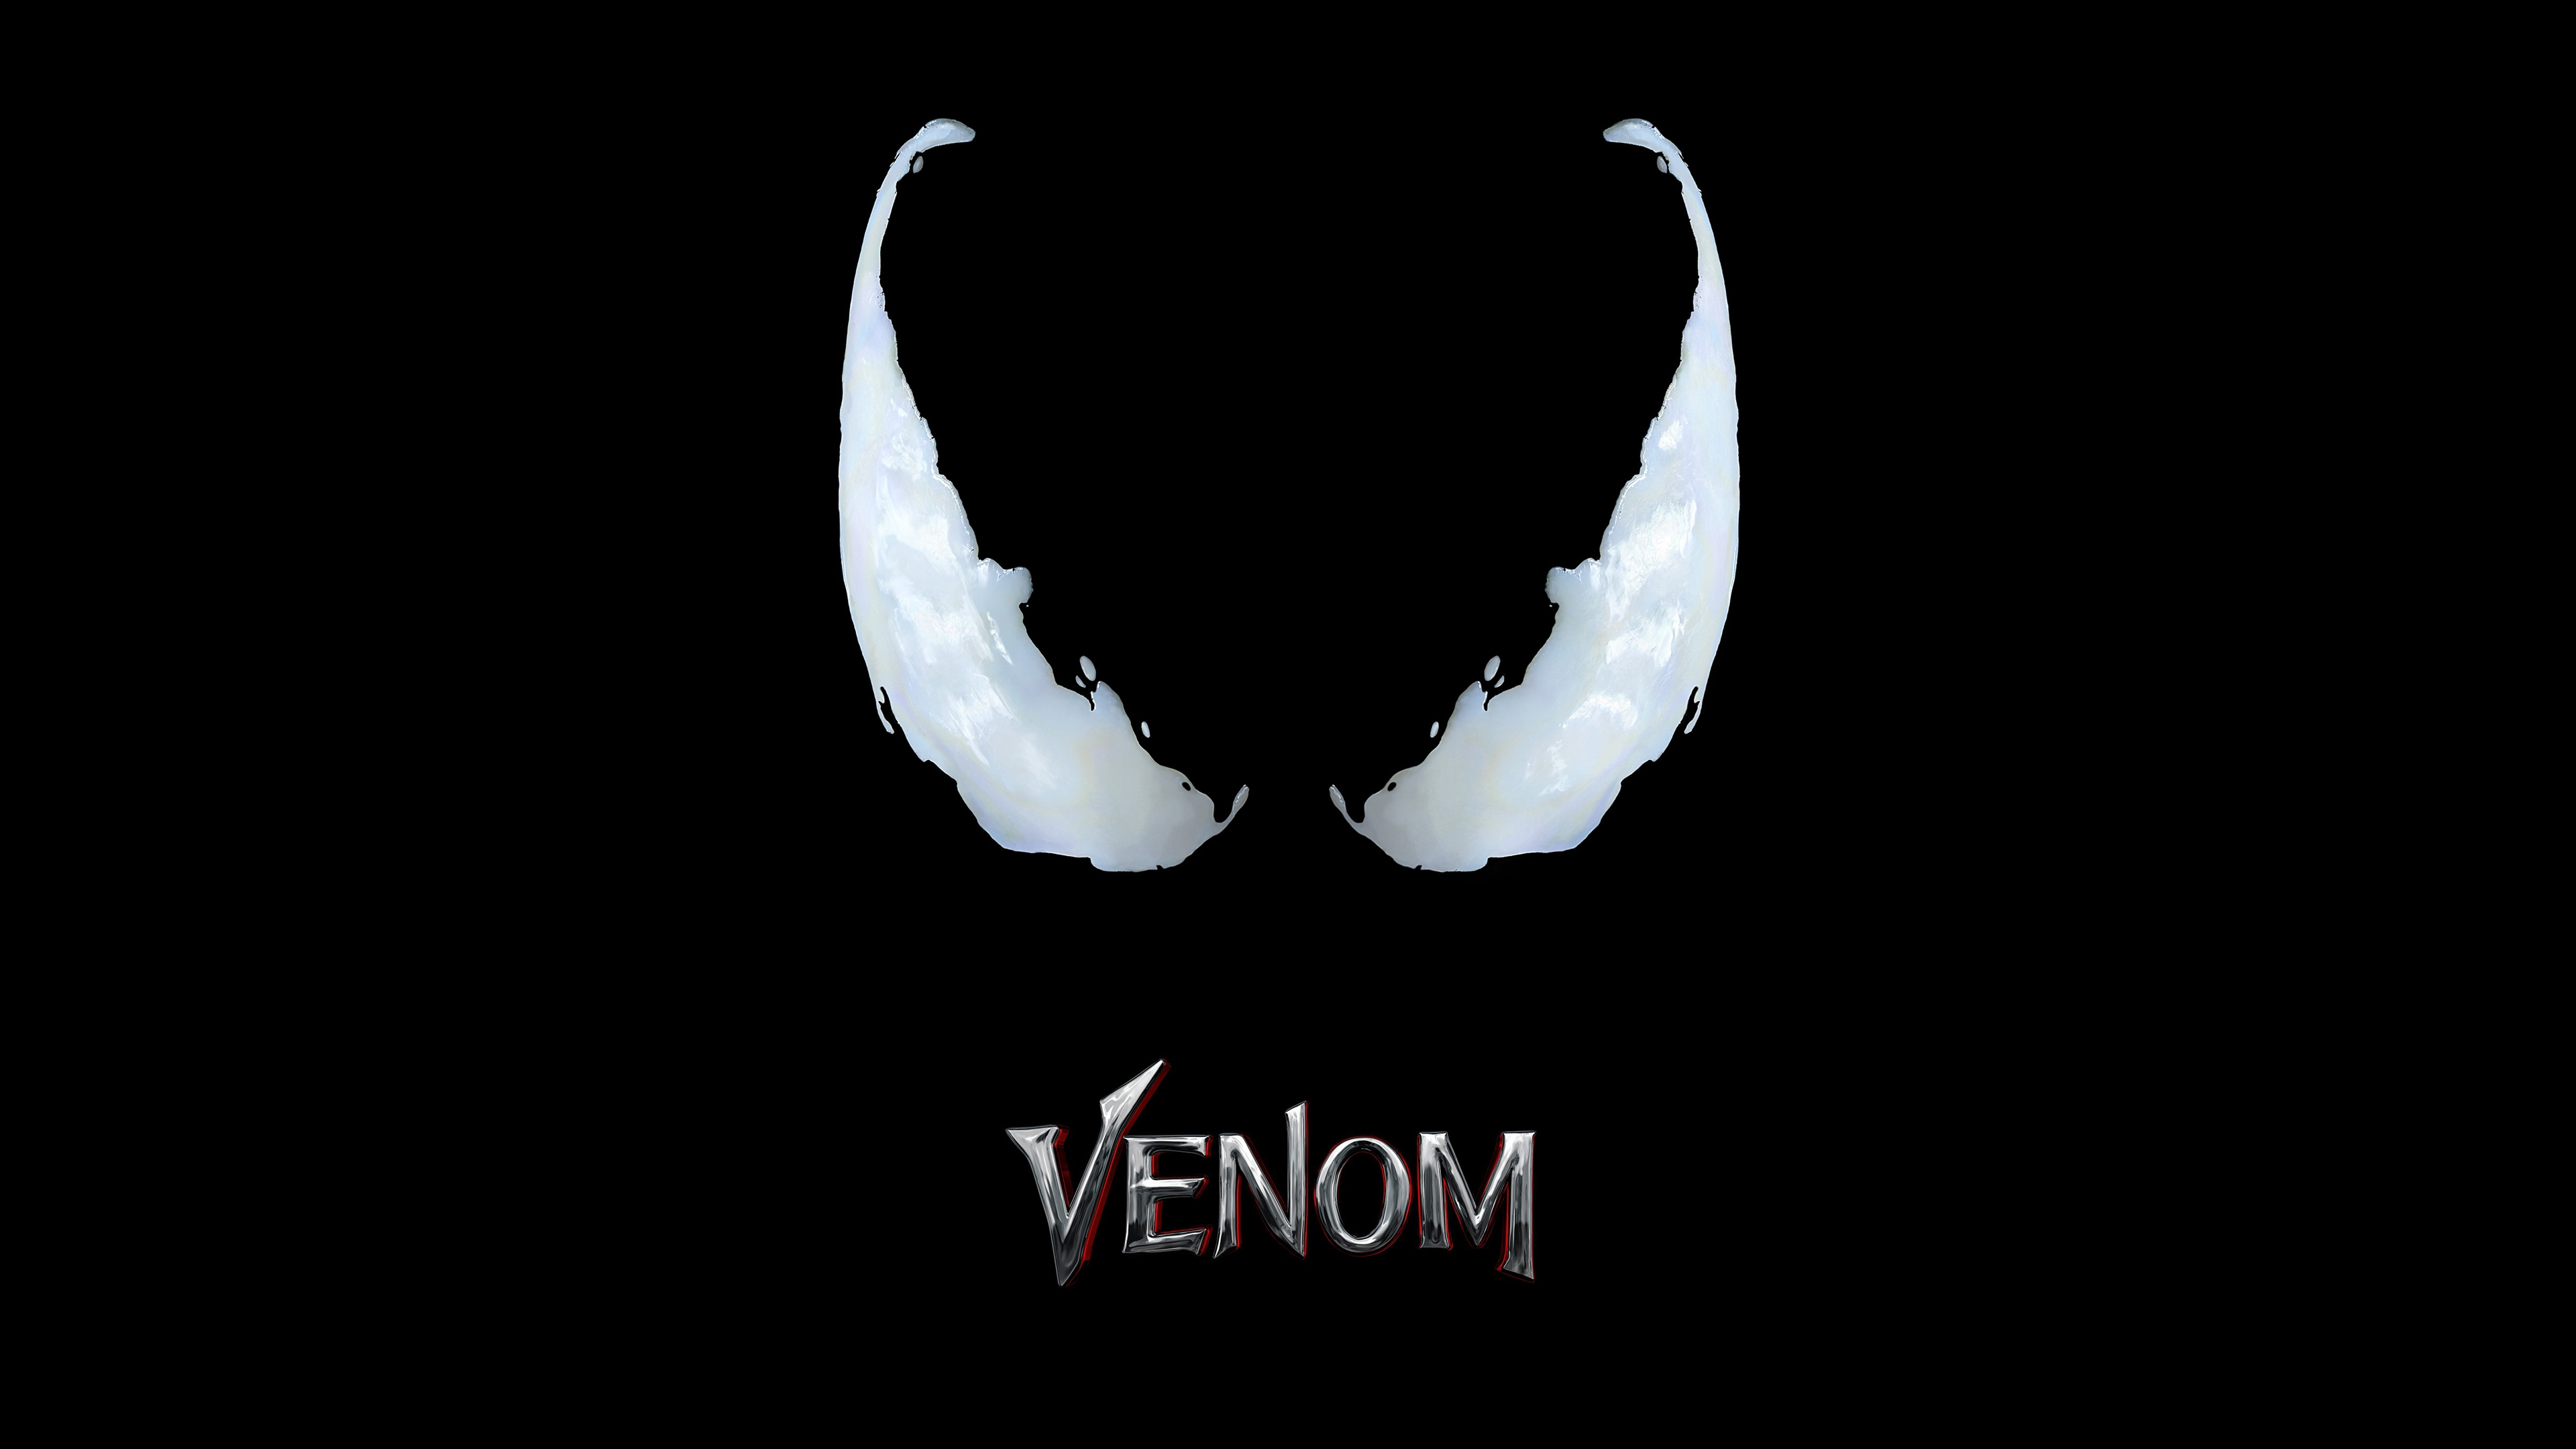 Venom movie background 2